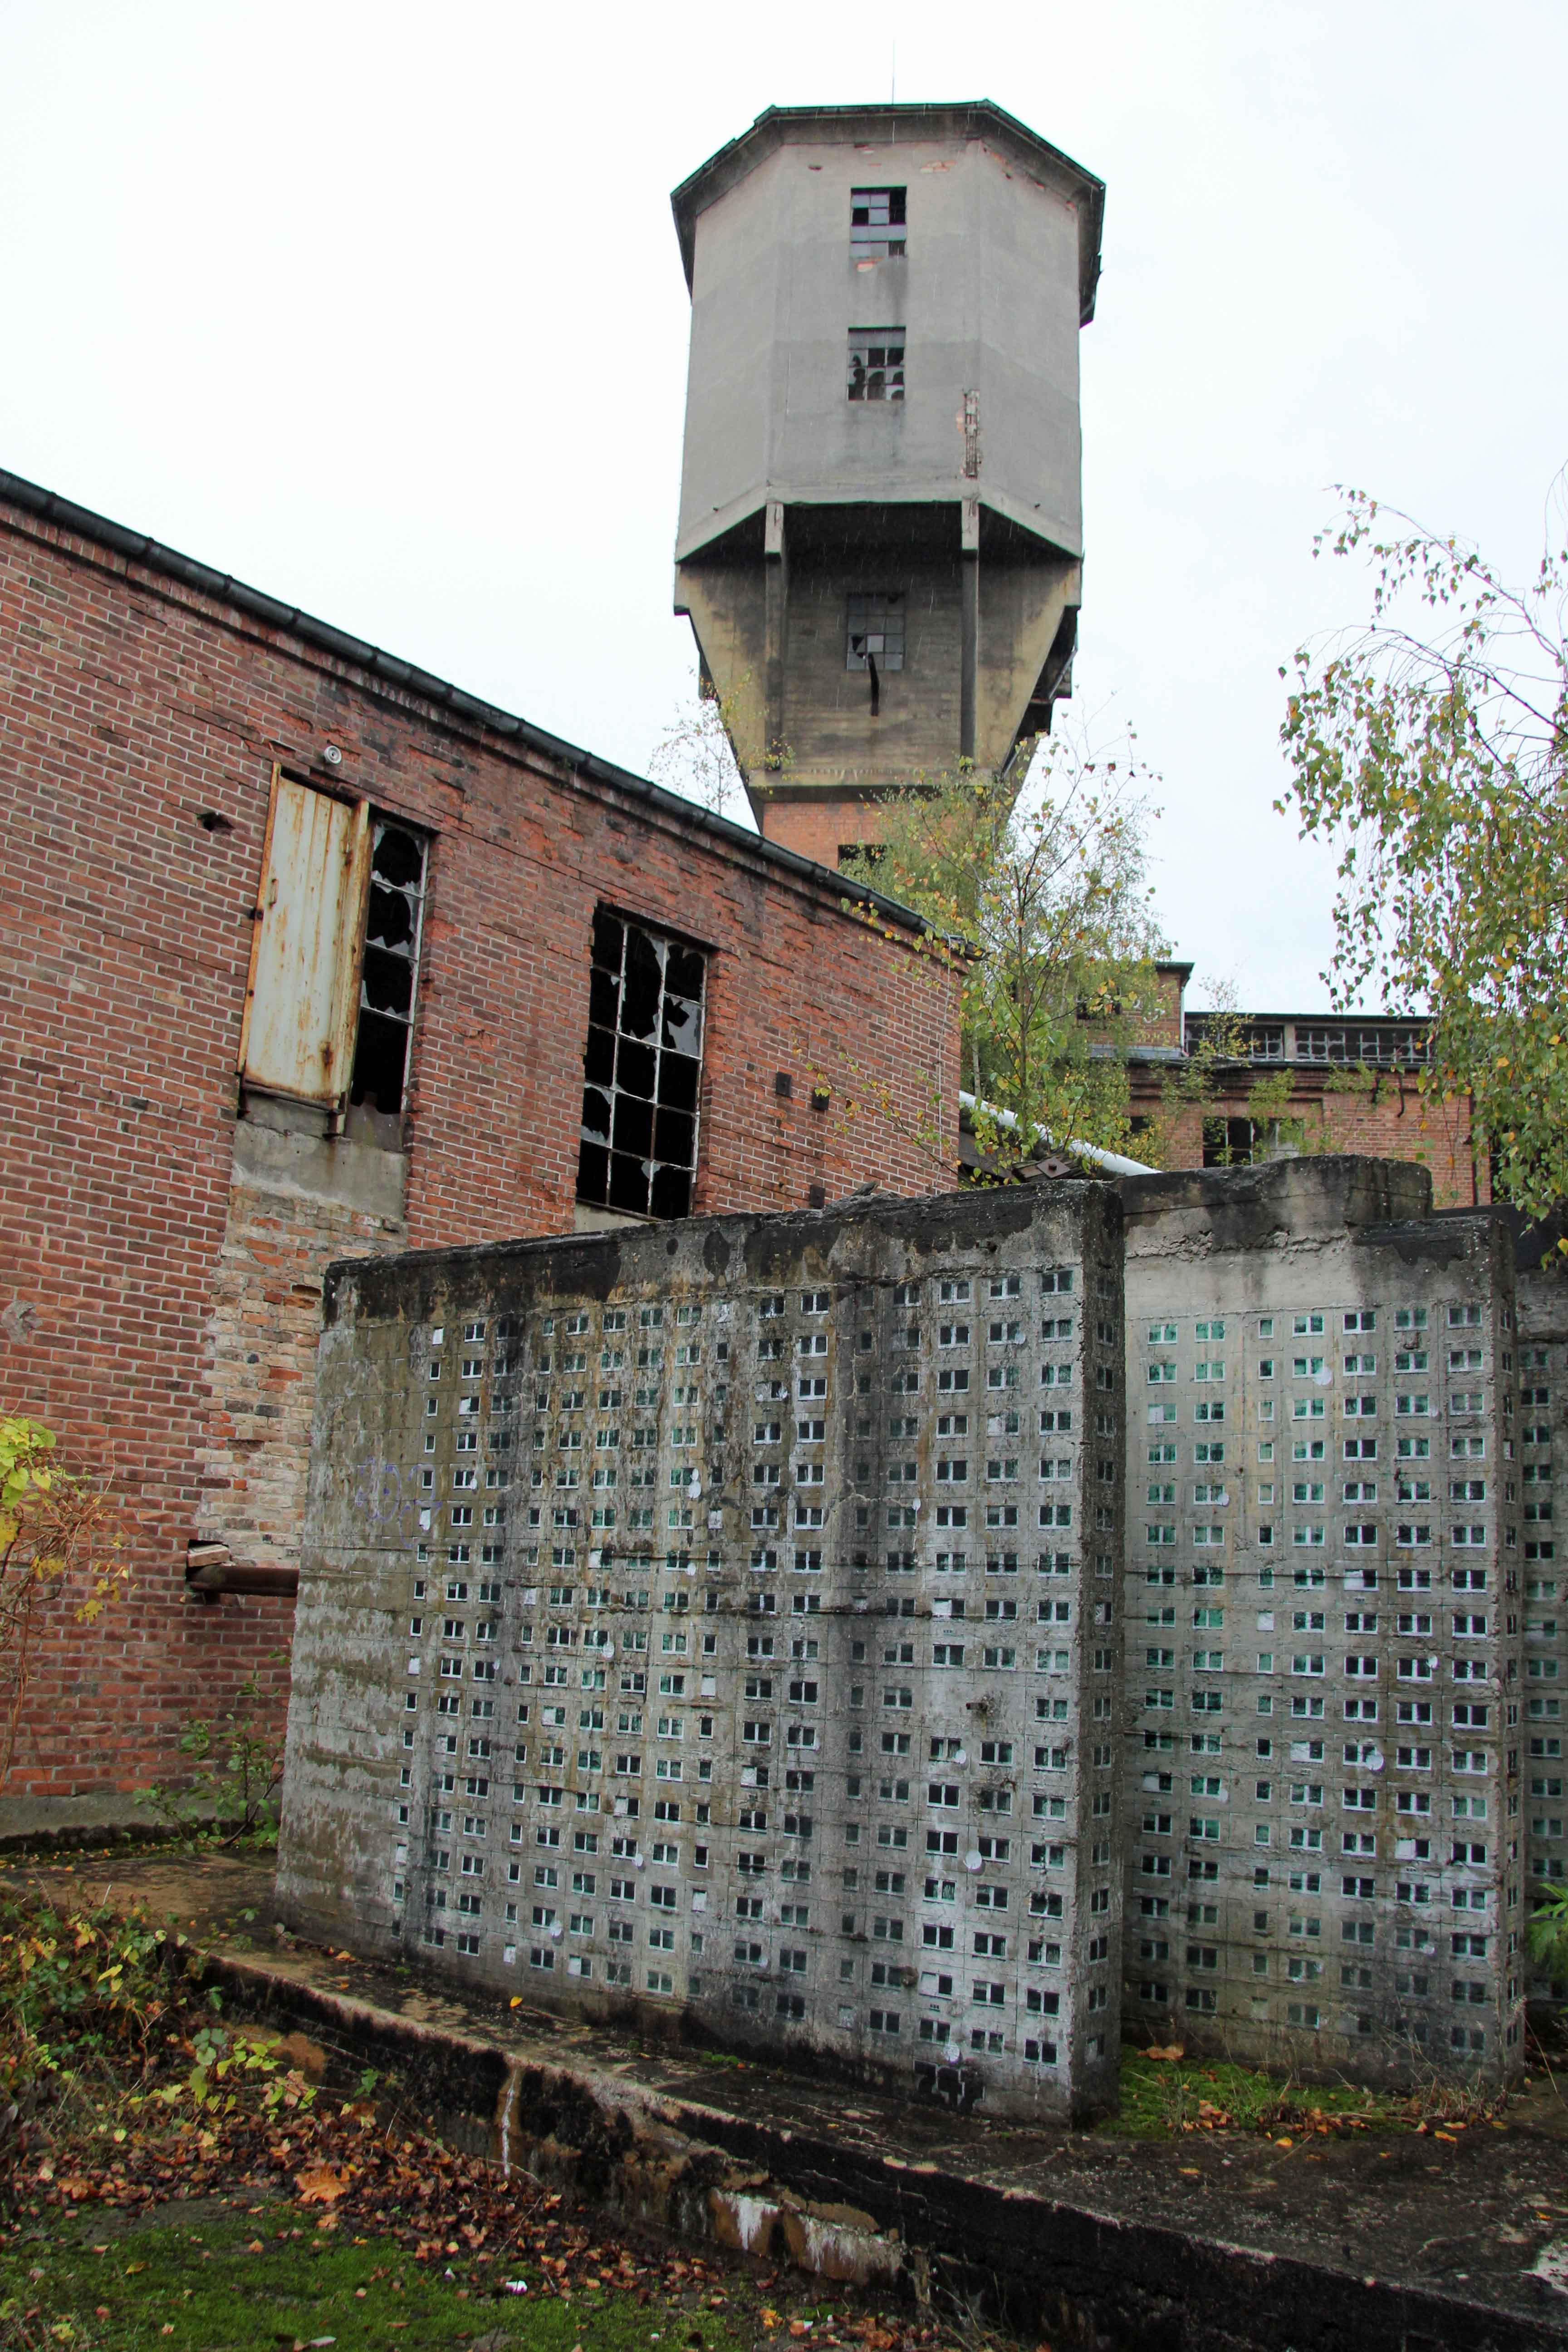 The outside of Papierfabrik Wolfswinkel, an abandoned paper mill near Berlin and artwork by EVOL